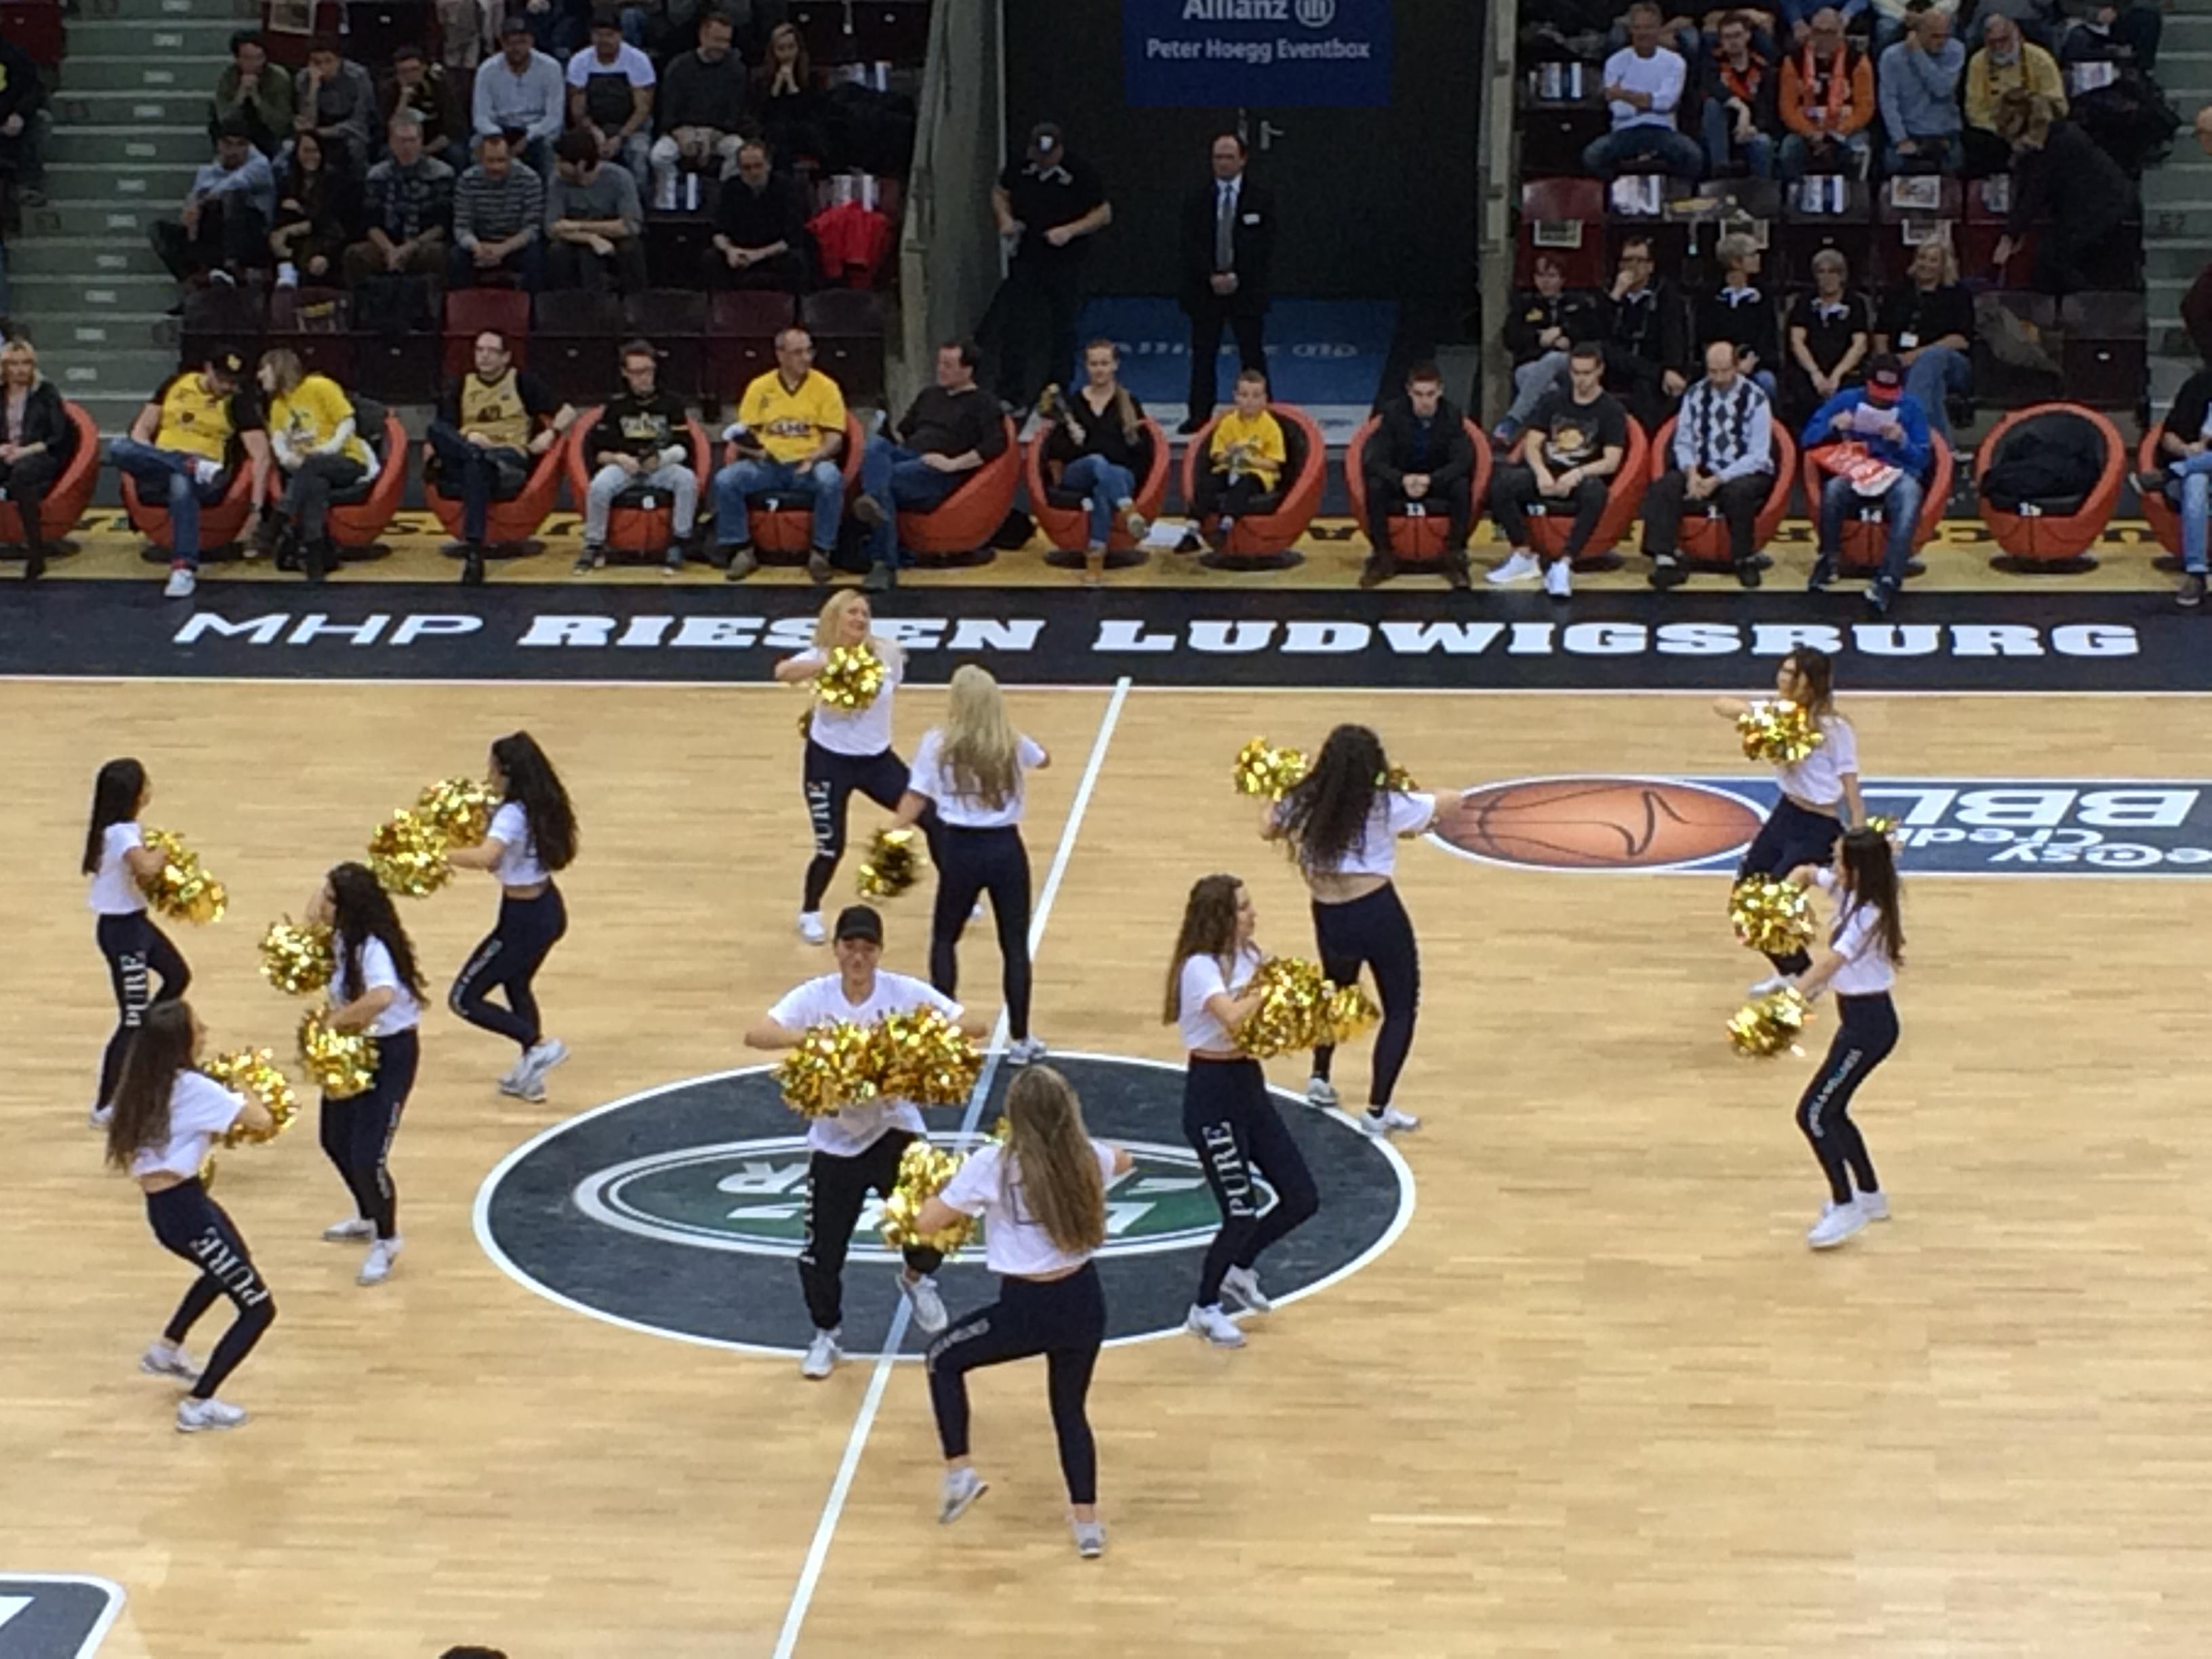 Basketballspiel in Ludwigsburg im Januar